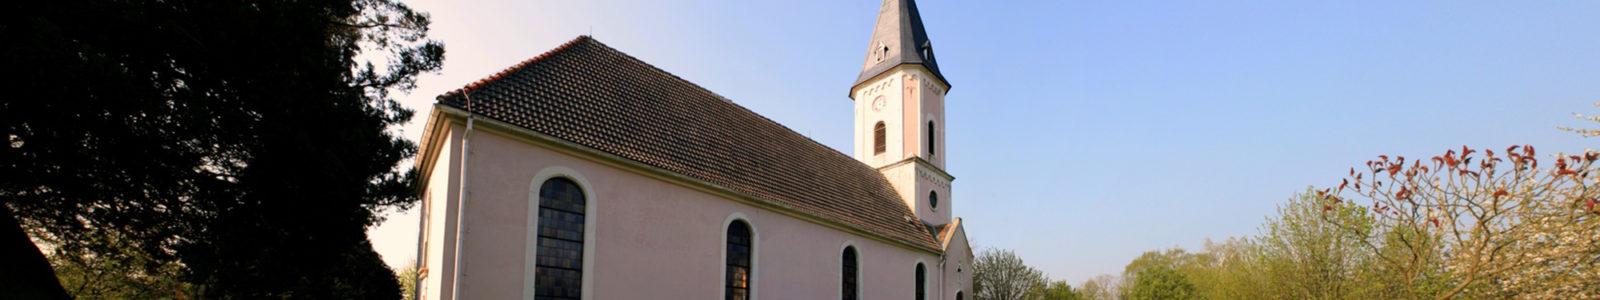 Kirche in Bucha